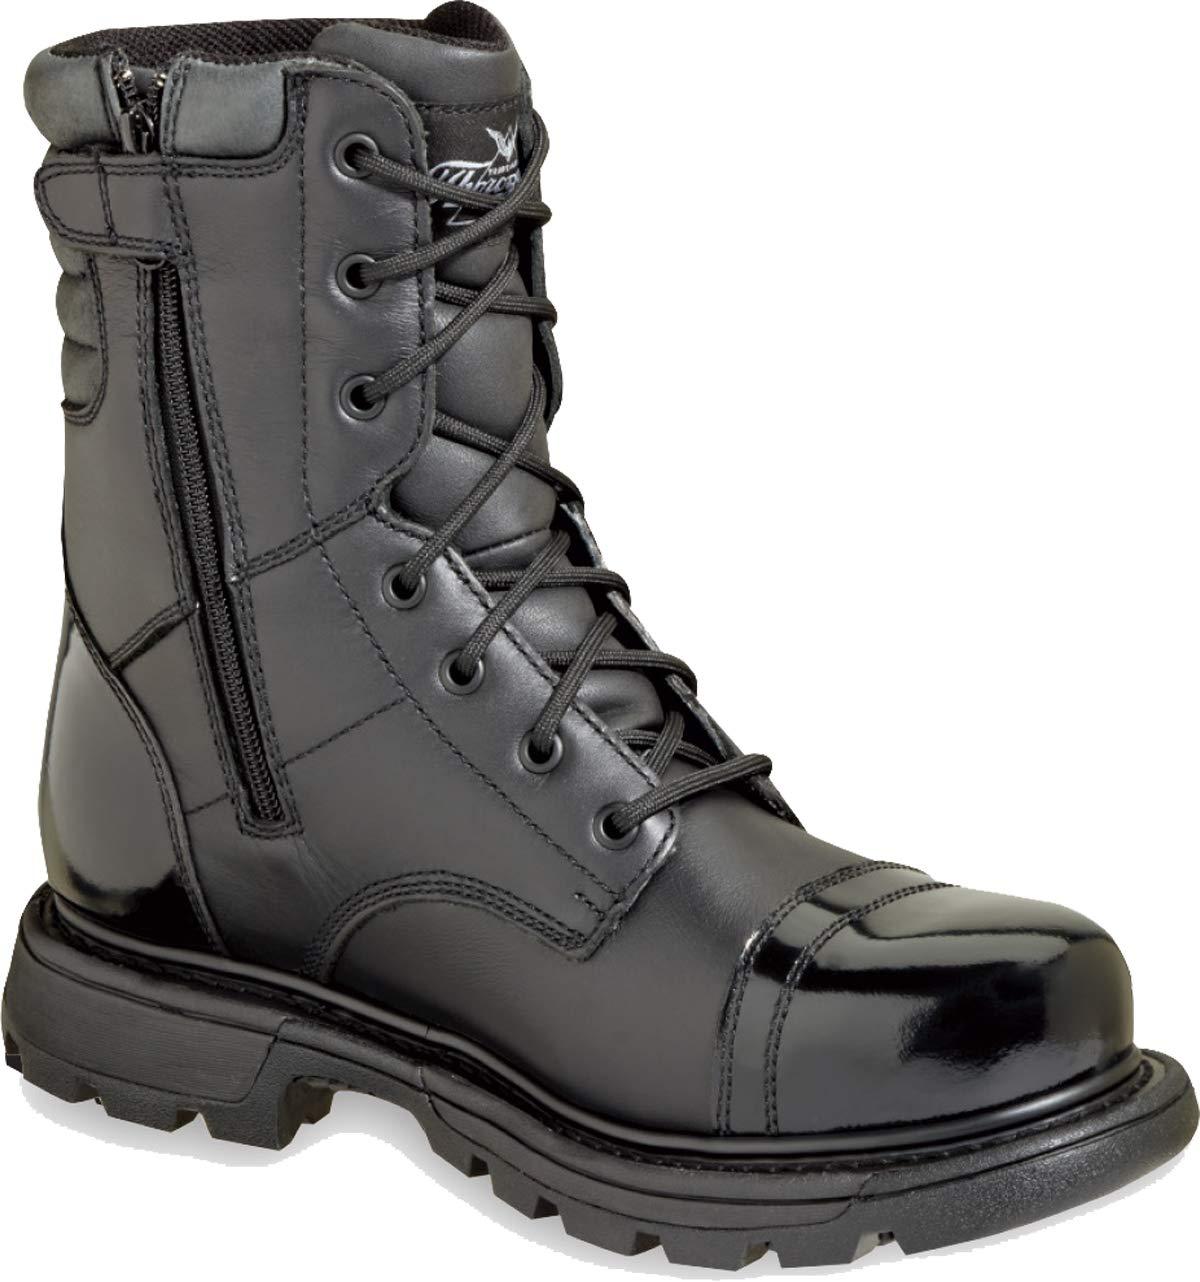 Thorogood Men's 8'' Side Zip Jump Boot Gen-flex,Black,10 M US